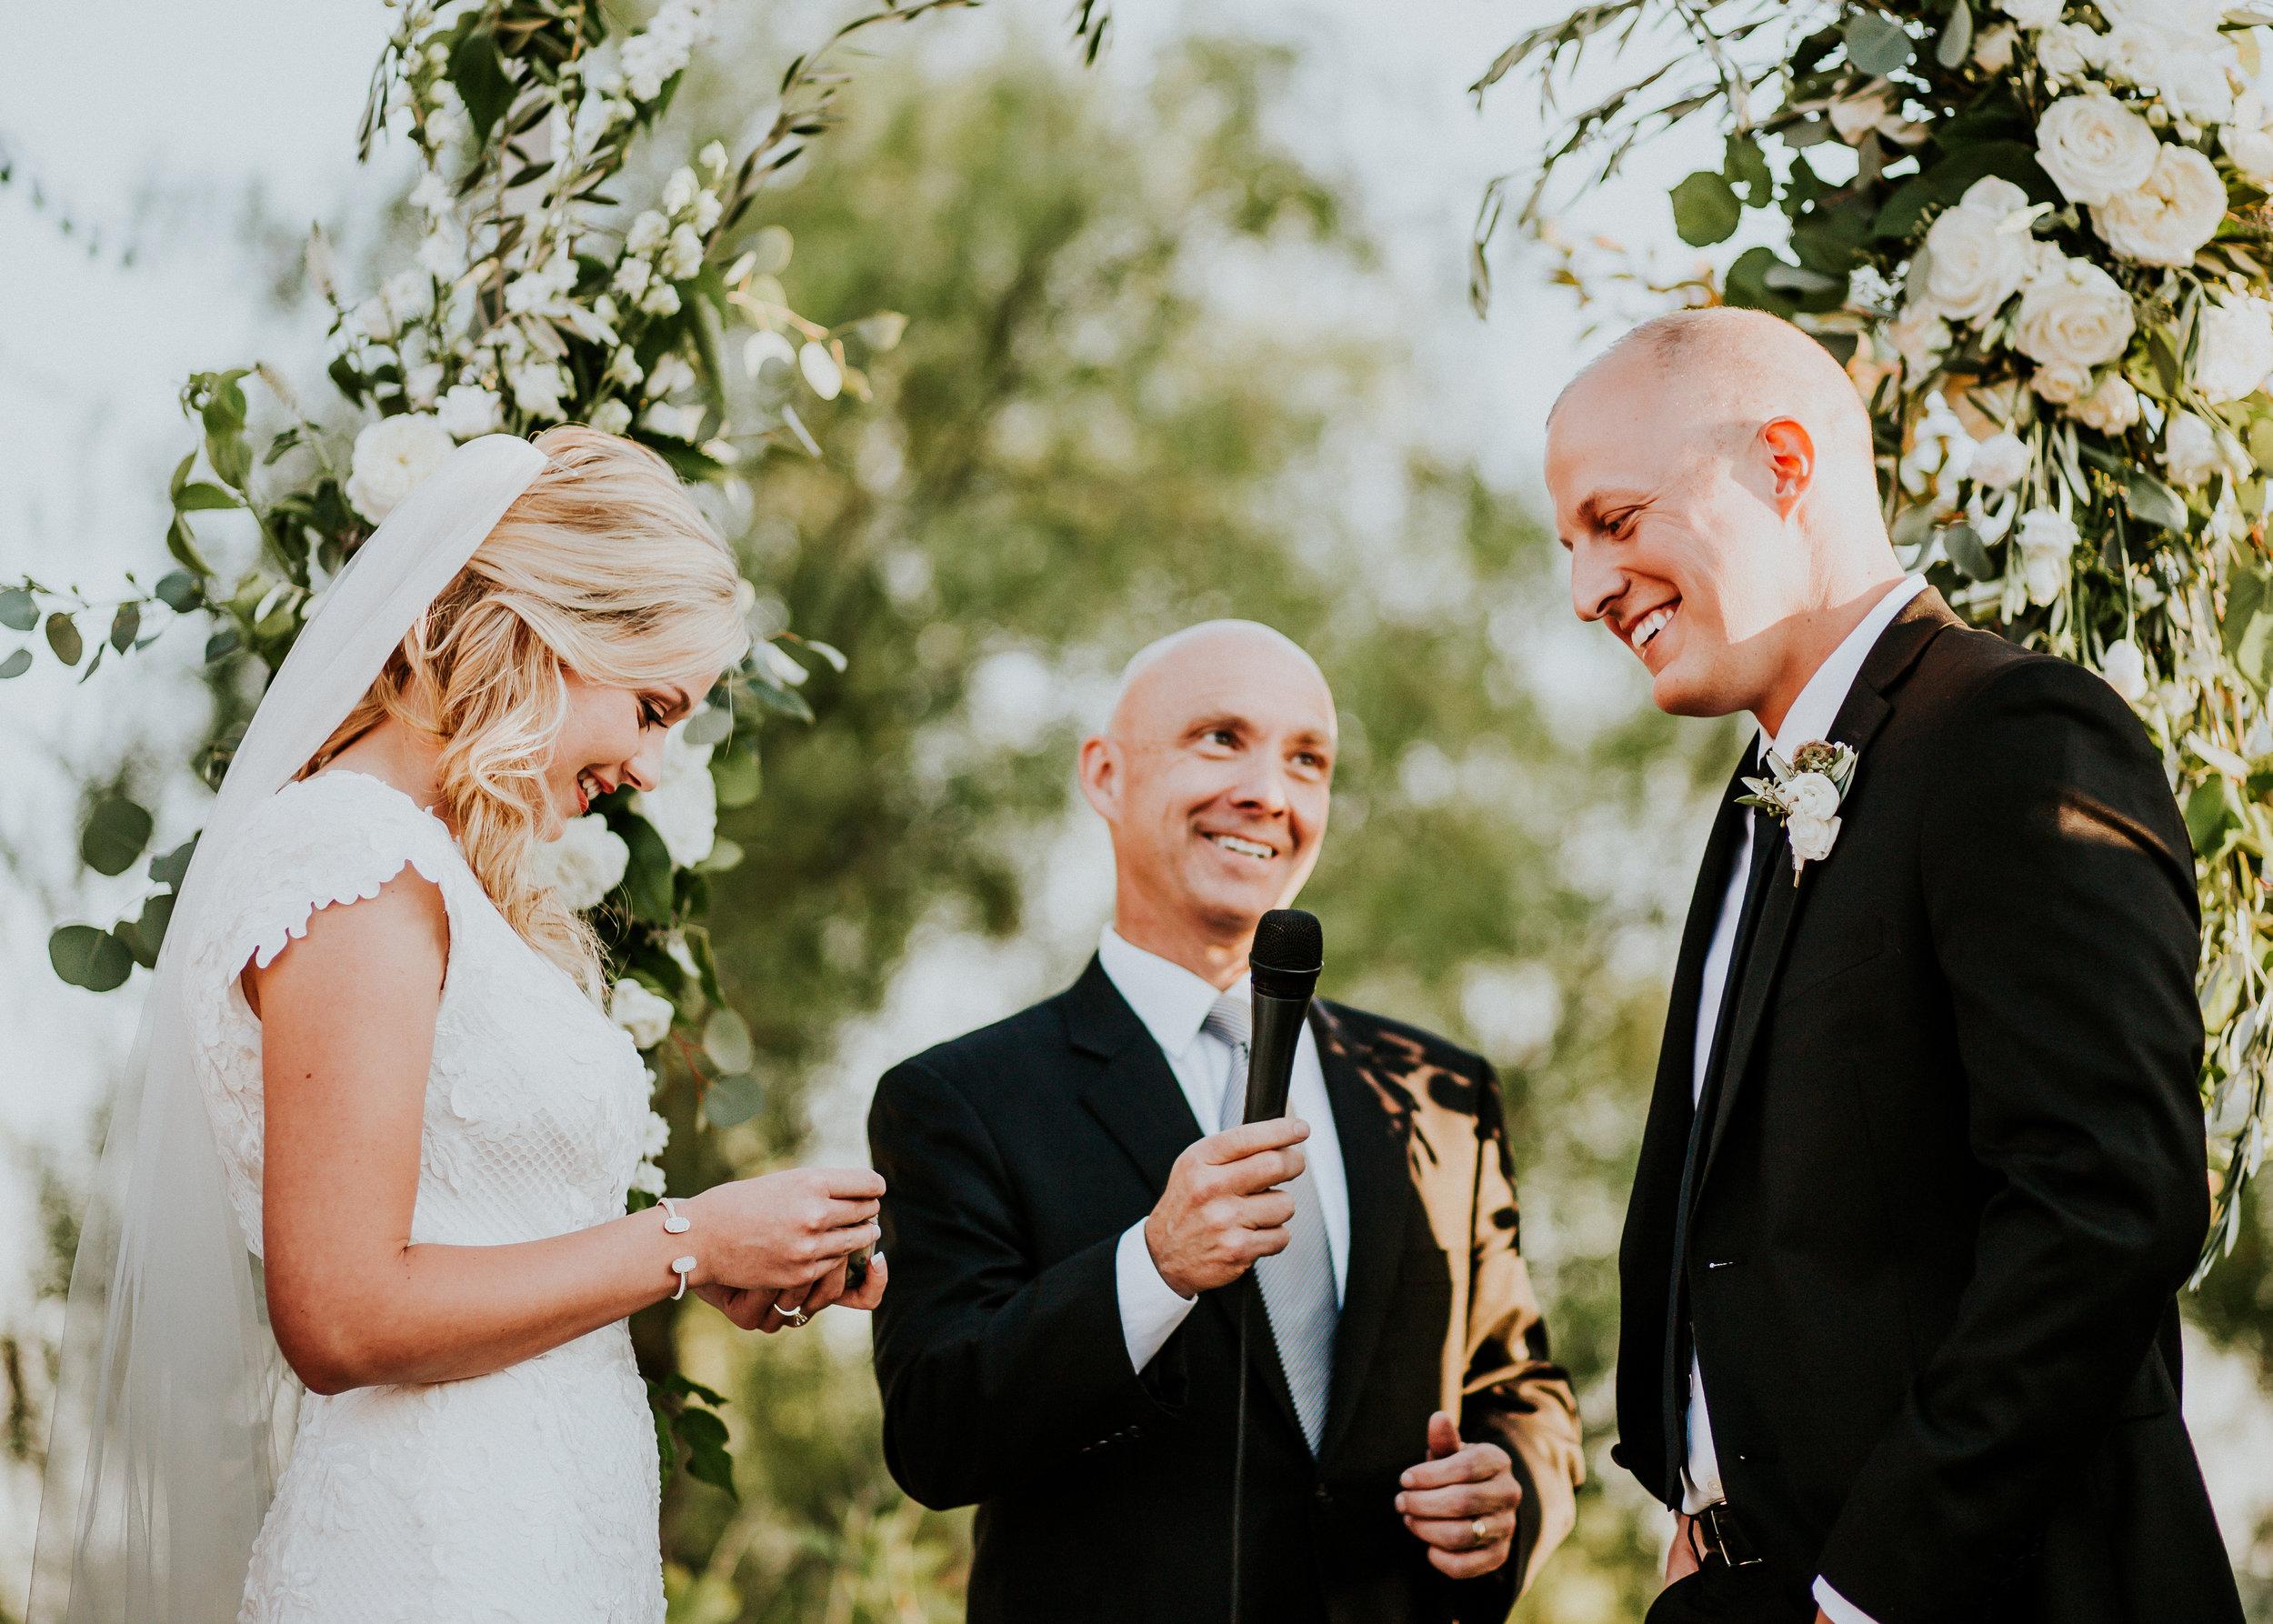 WeddingDay-366.jpg